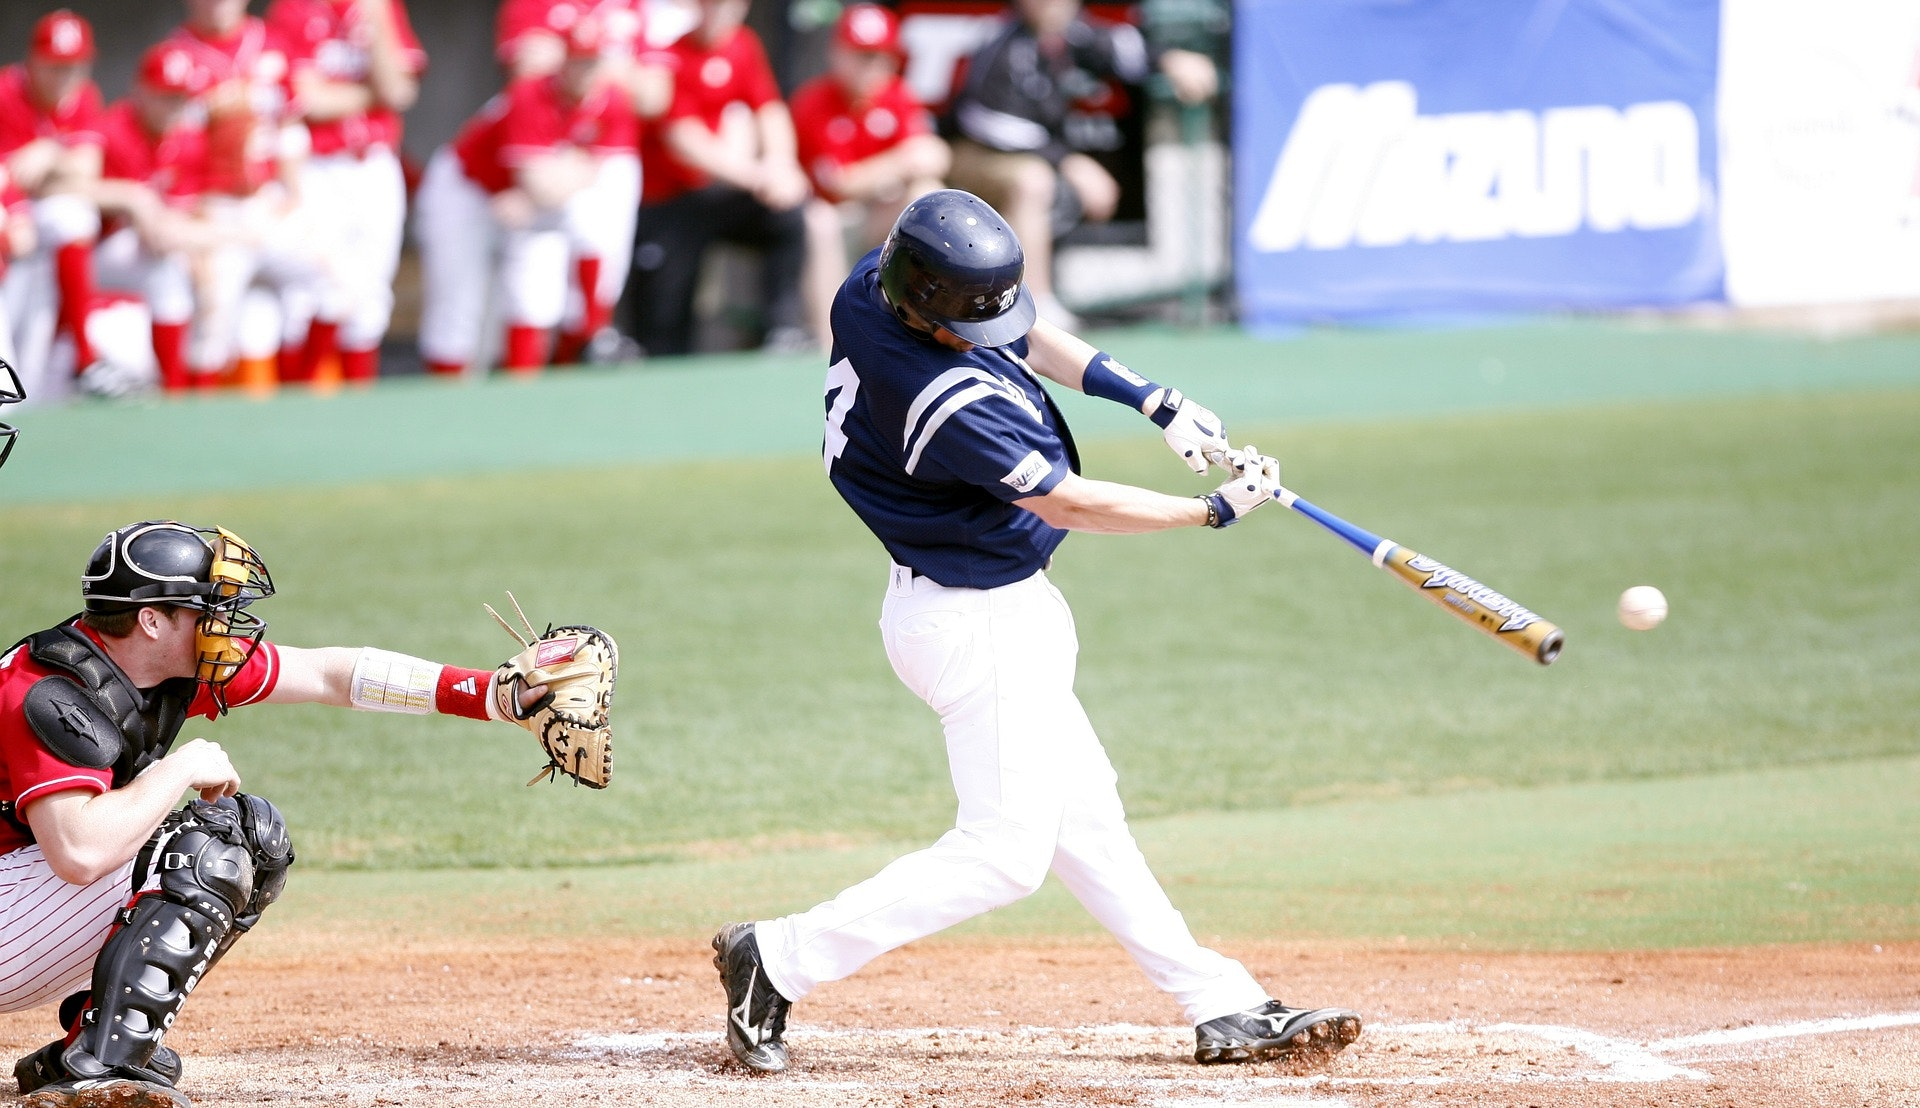 Baseball, USAs nasjonalsport © Keith Johnston, Pixabay